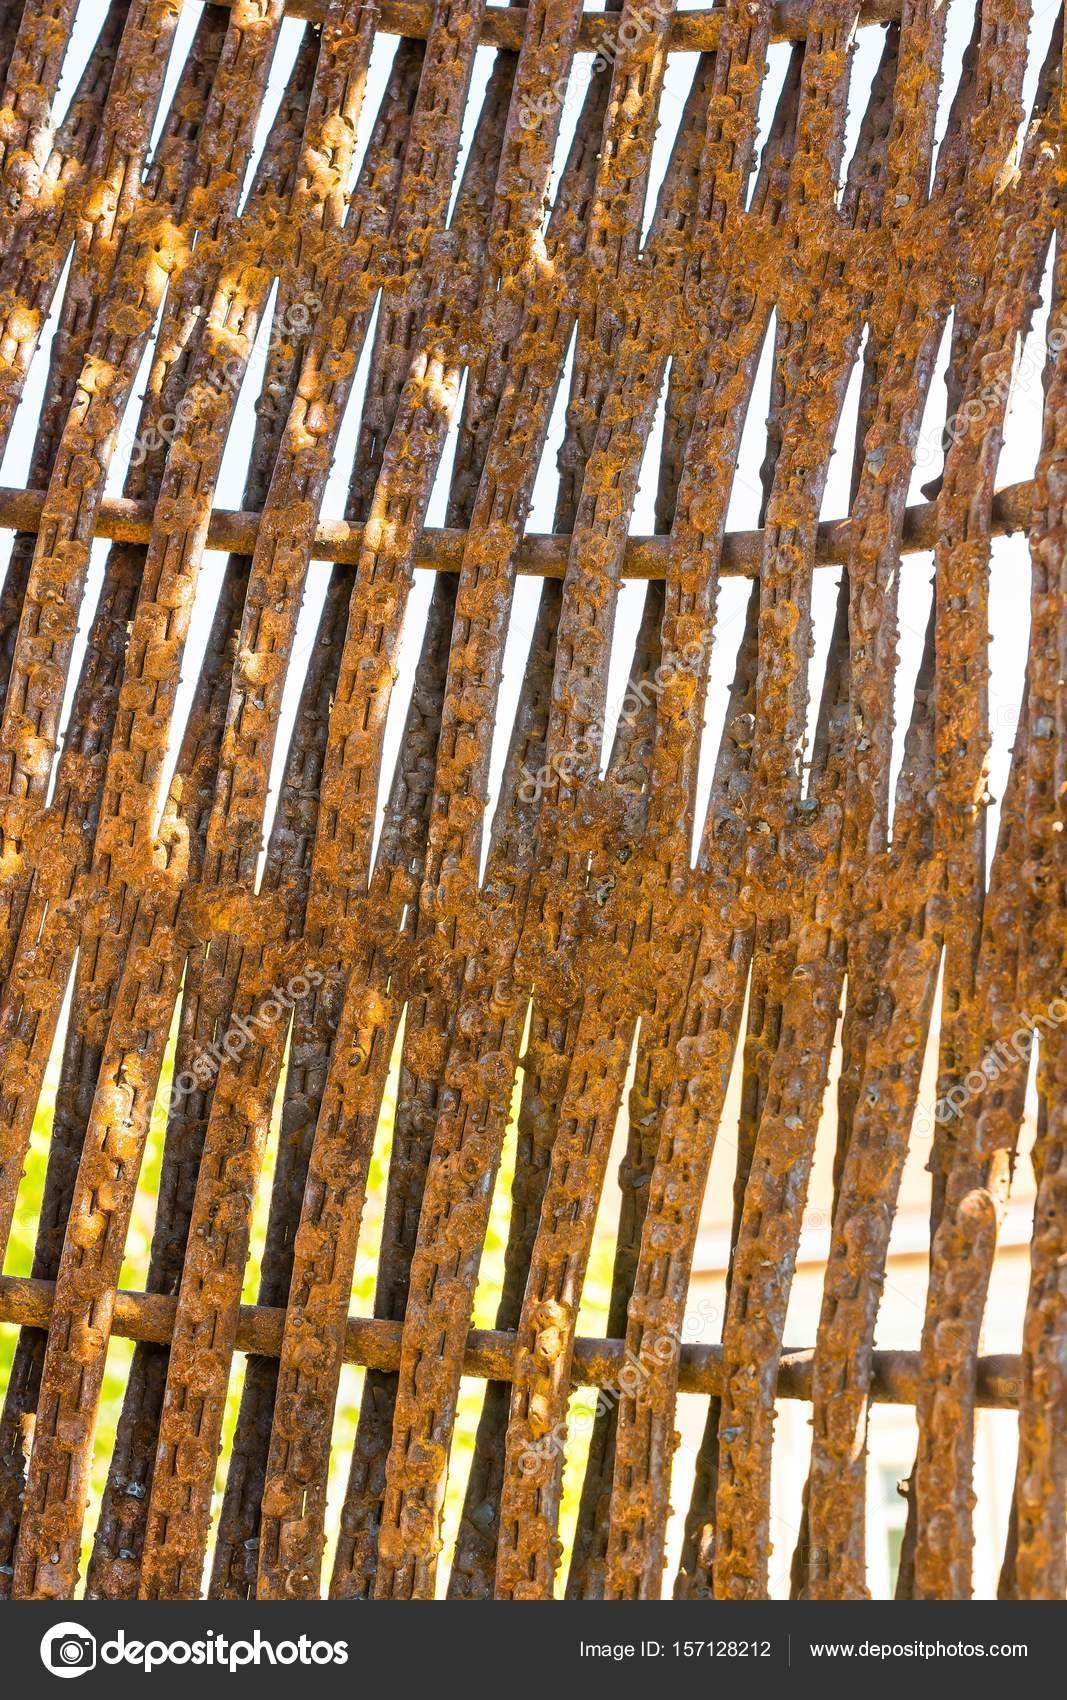 Alten Rostigen Zaun Nahaufnahme Textur Stockfoto C Tamascsere